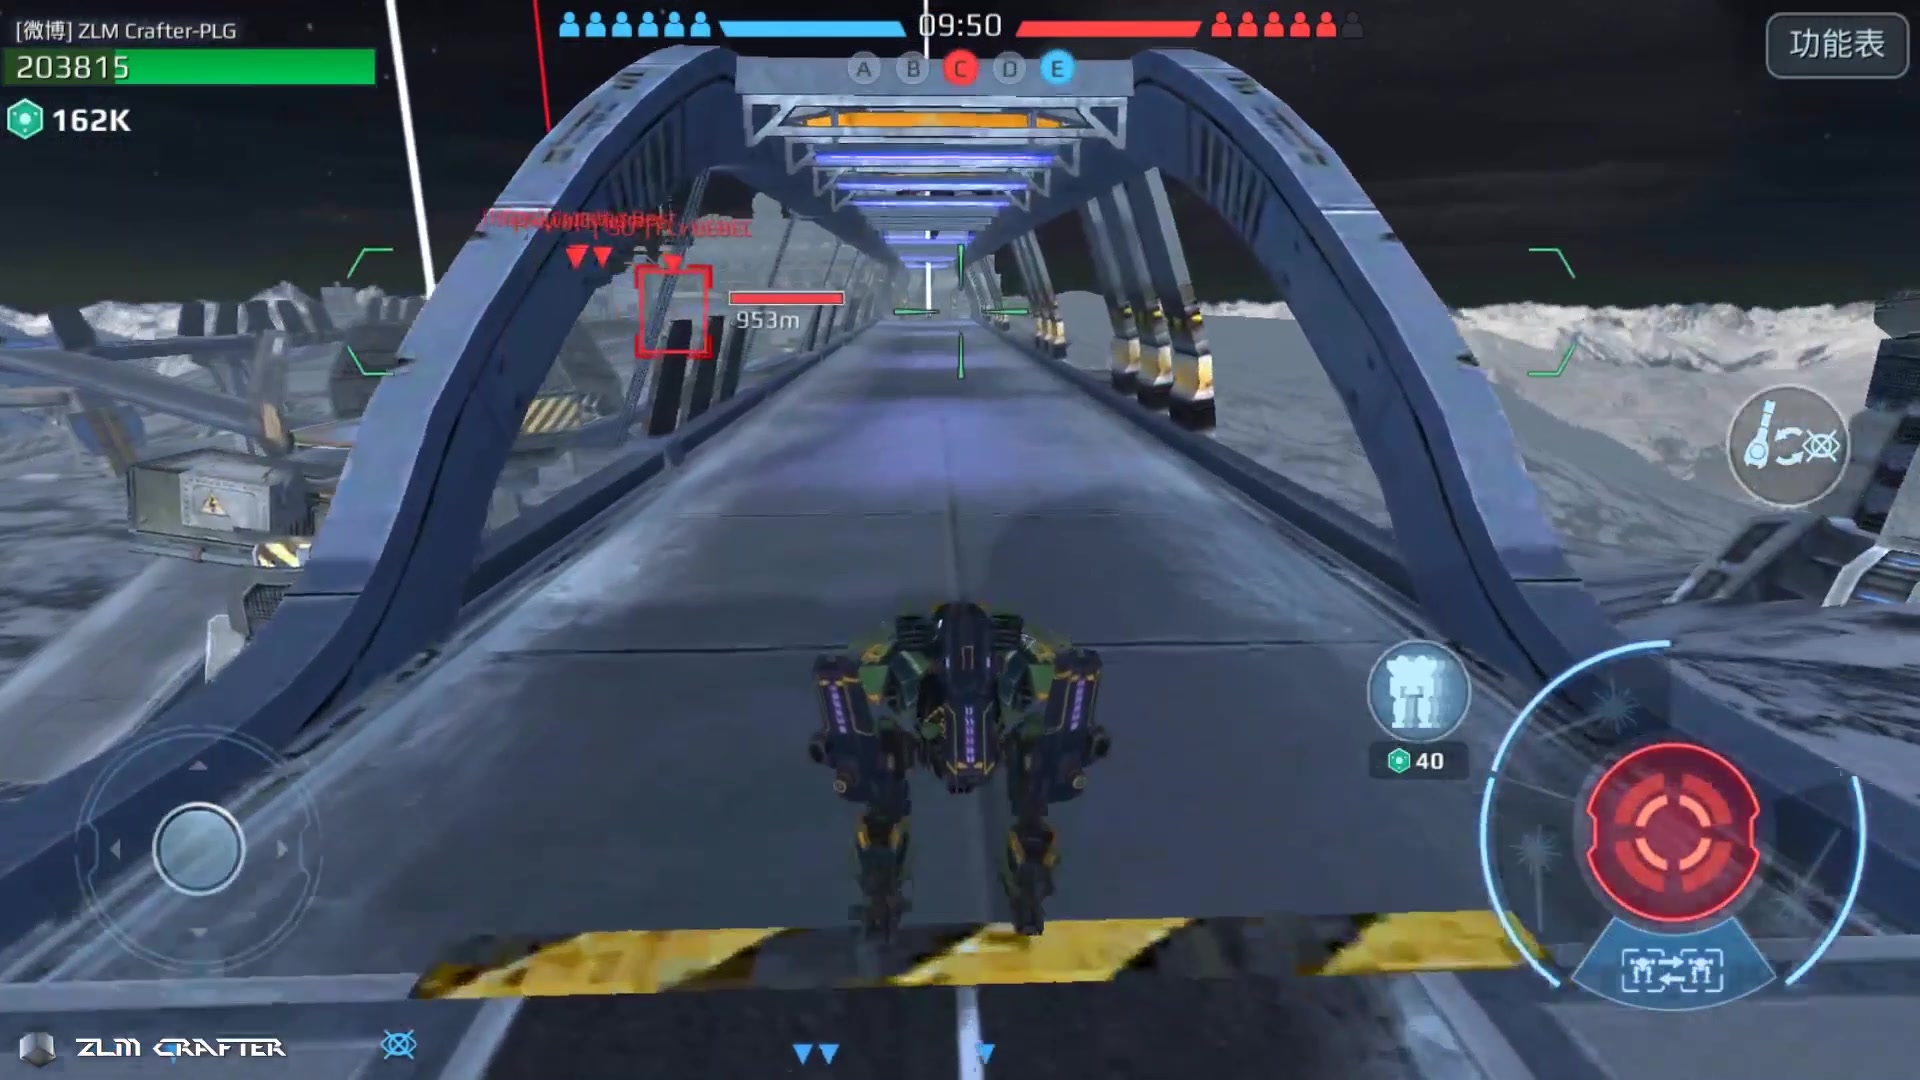 【War Robots】你想抢中塔?好的,我去抢你们家塔